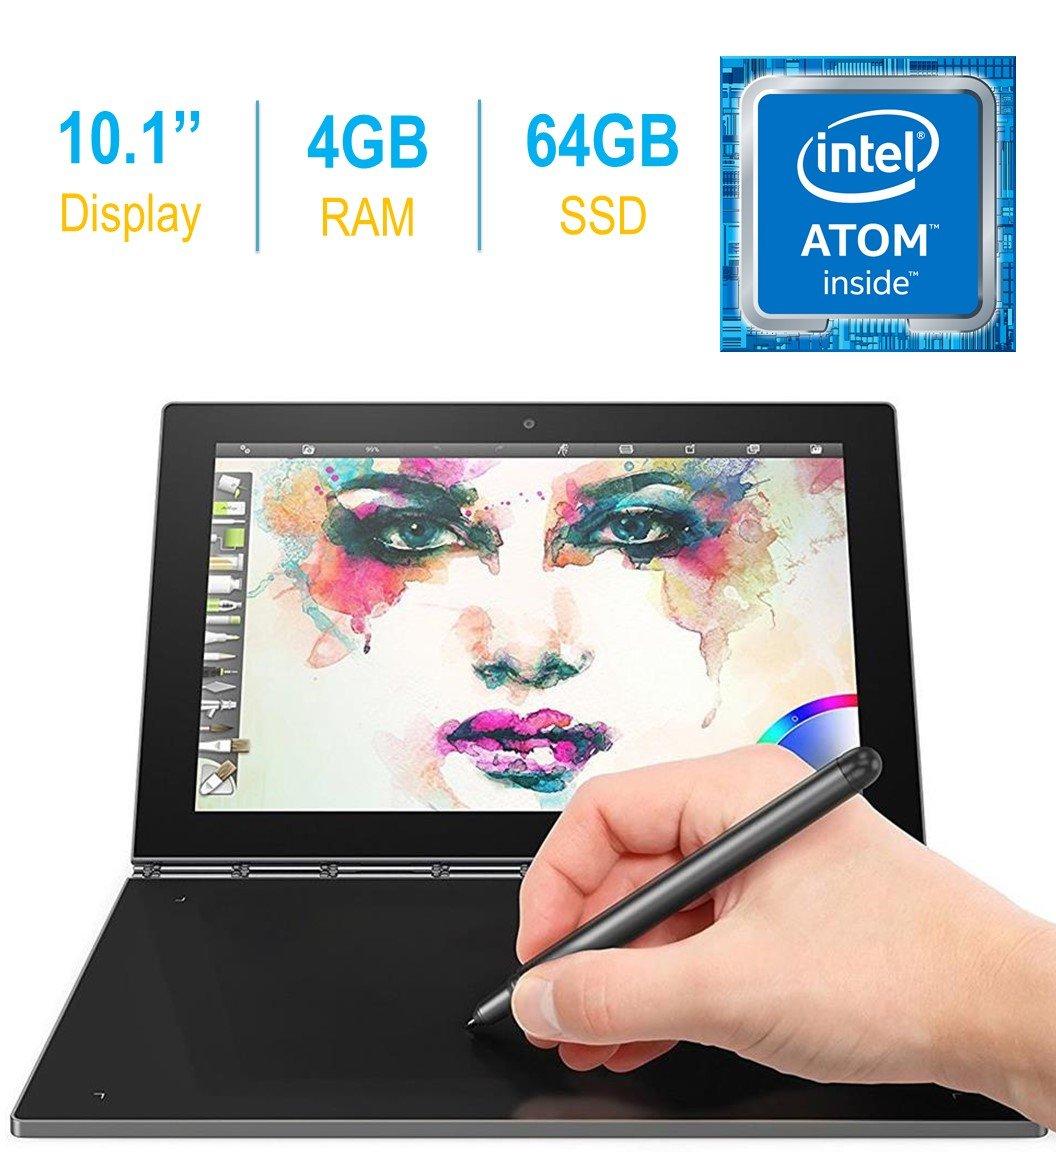 2017 Newest Lenovo Yoga Book 10.1-inch FHD Touch IPS 2-in-1 Tablet PC, Intel Atom x5-Z8550 1.44GHz, 4GB DDR3 RAM, 64GB SSD, Bluetooth, HD Graphics 400